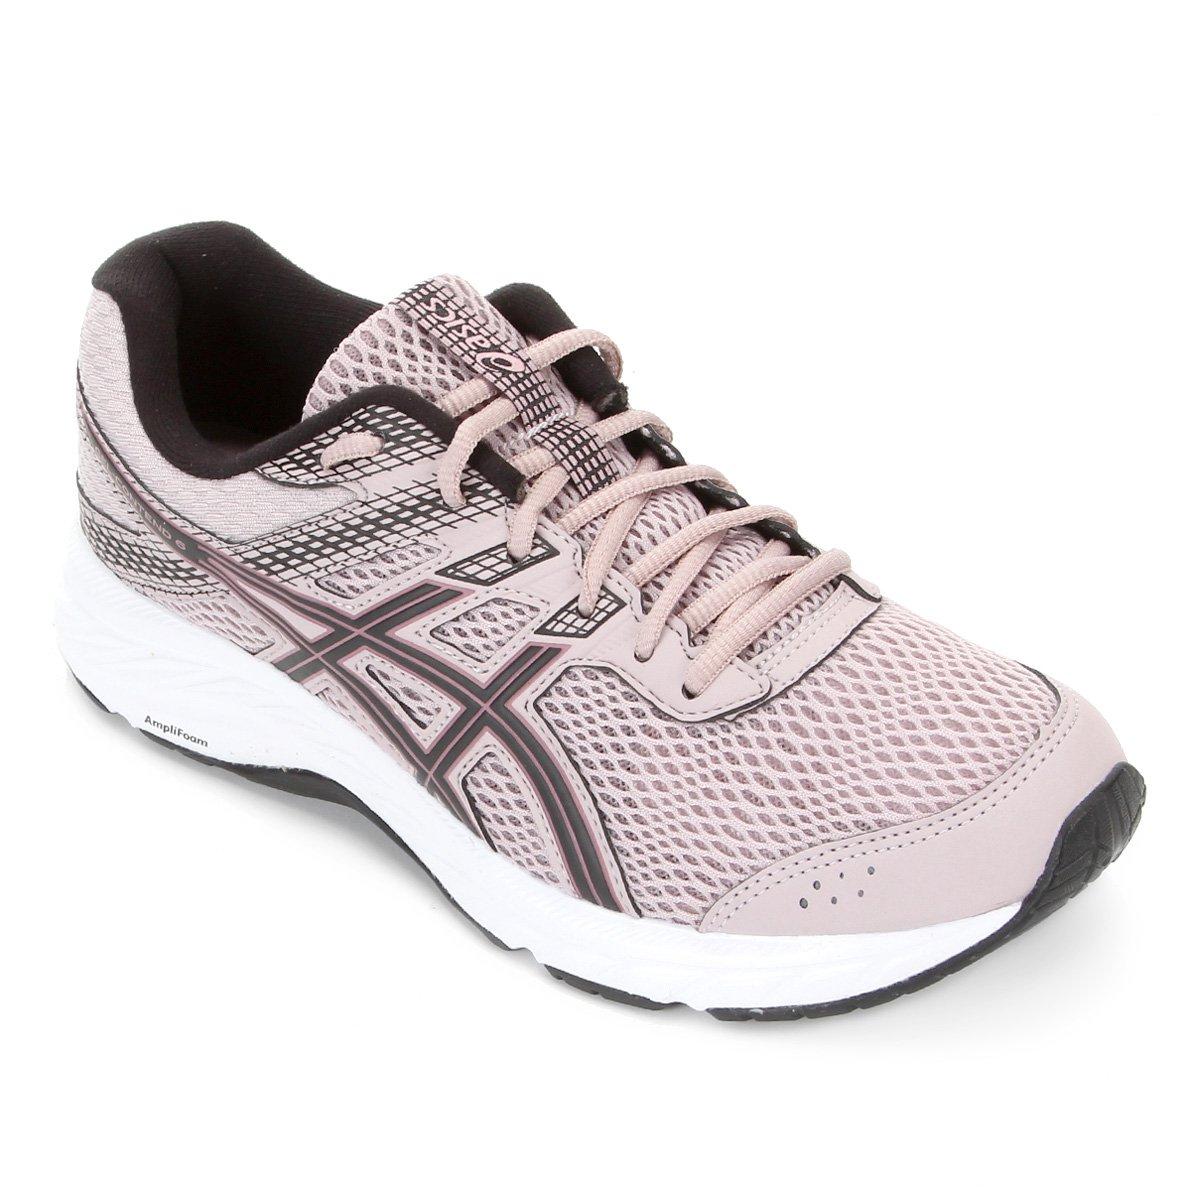 tenis asics gel feminino para caminhada netshoes precio